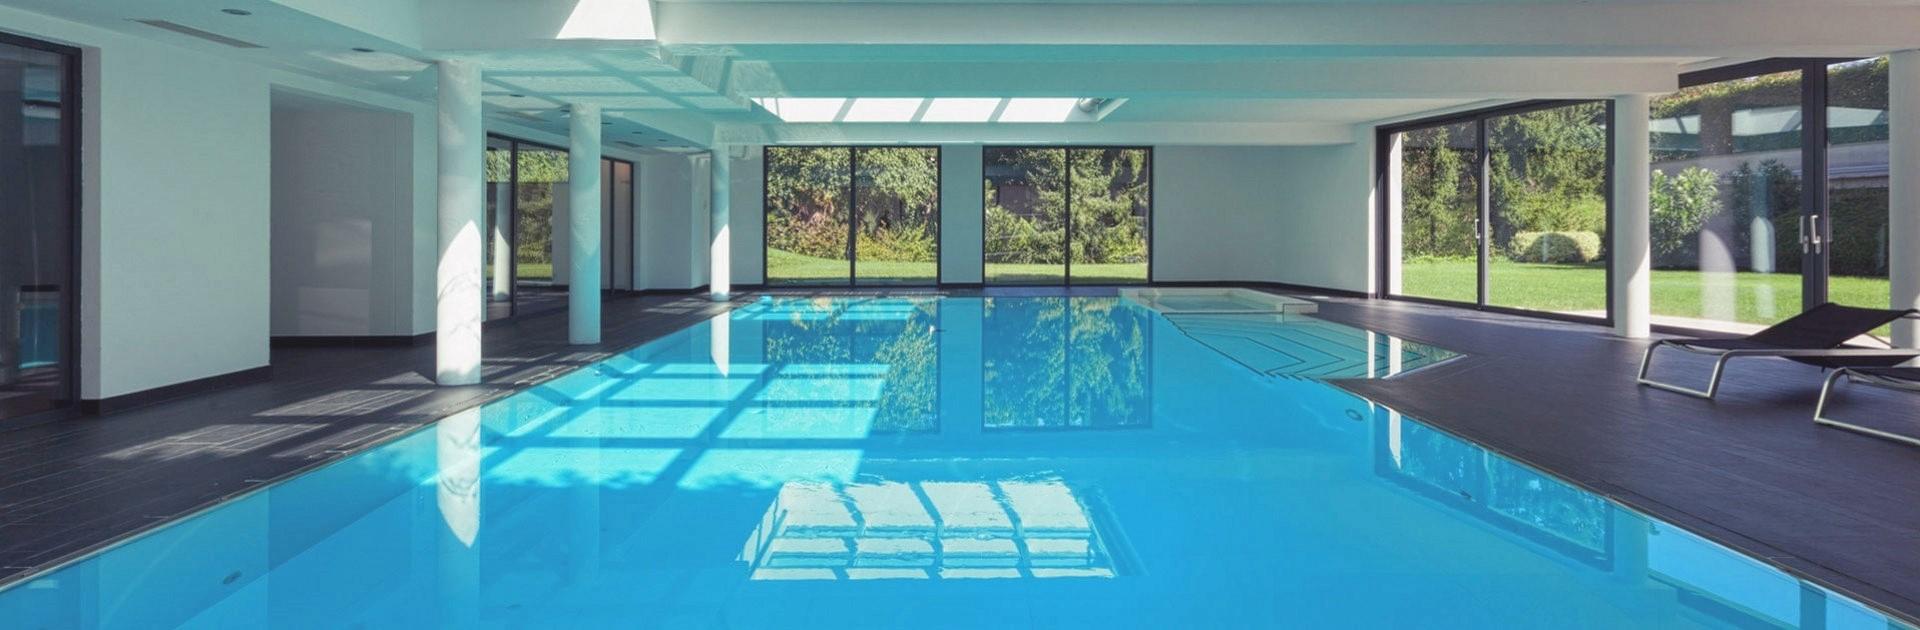 Cobertor solar piscinas